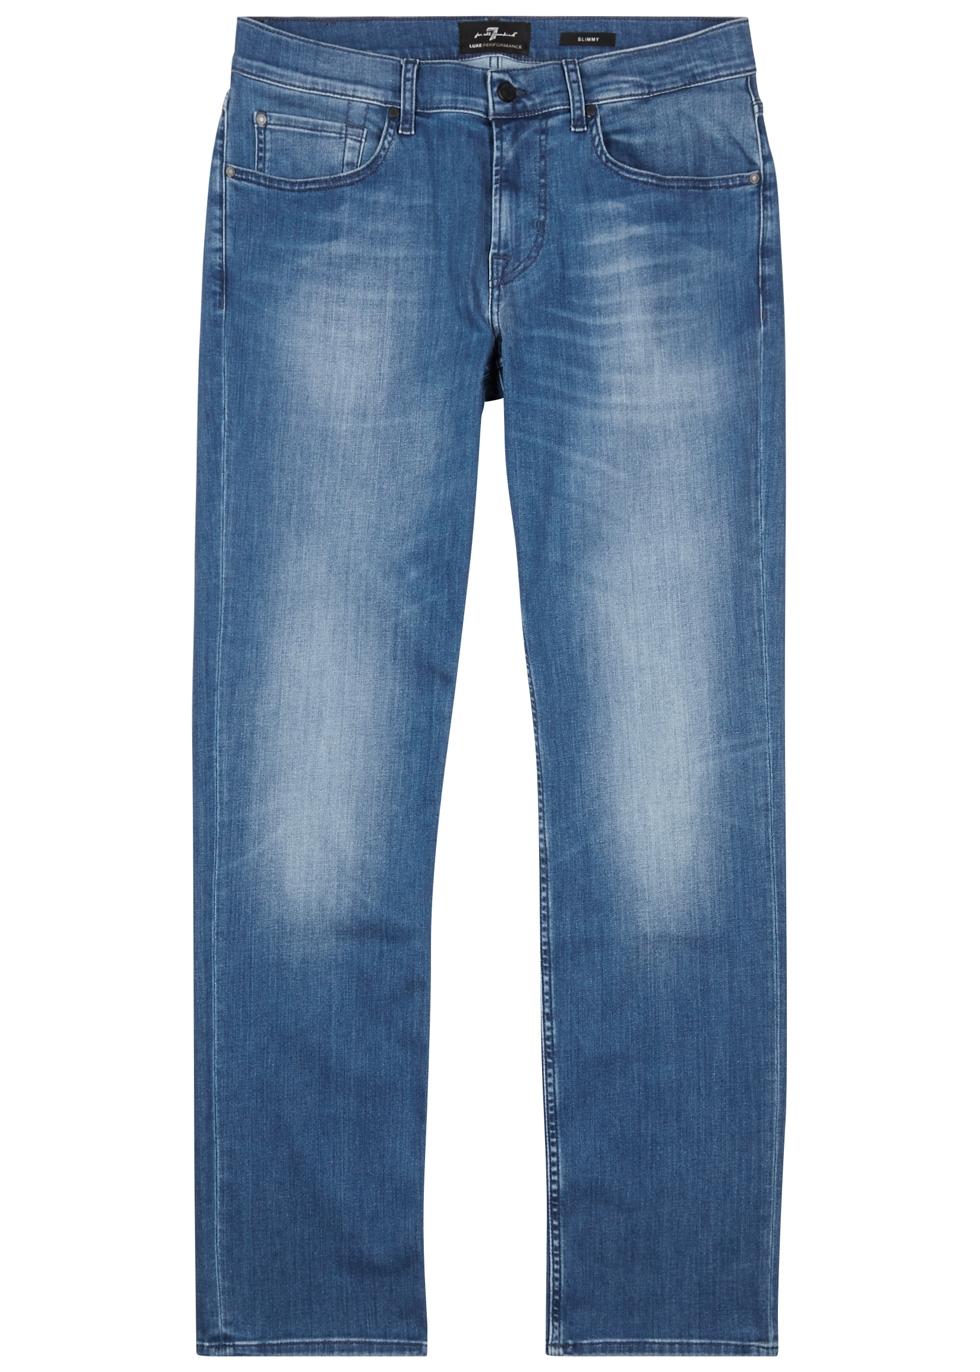 Slimmy Luxe Performance slim-leg jeans